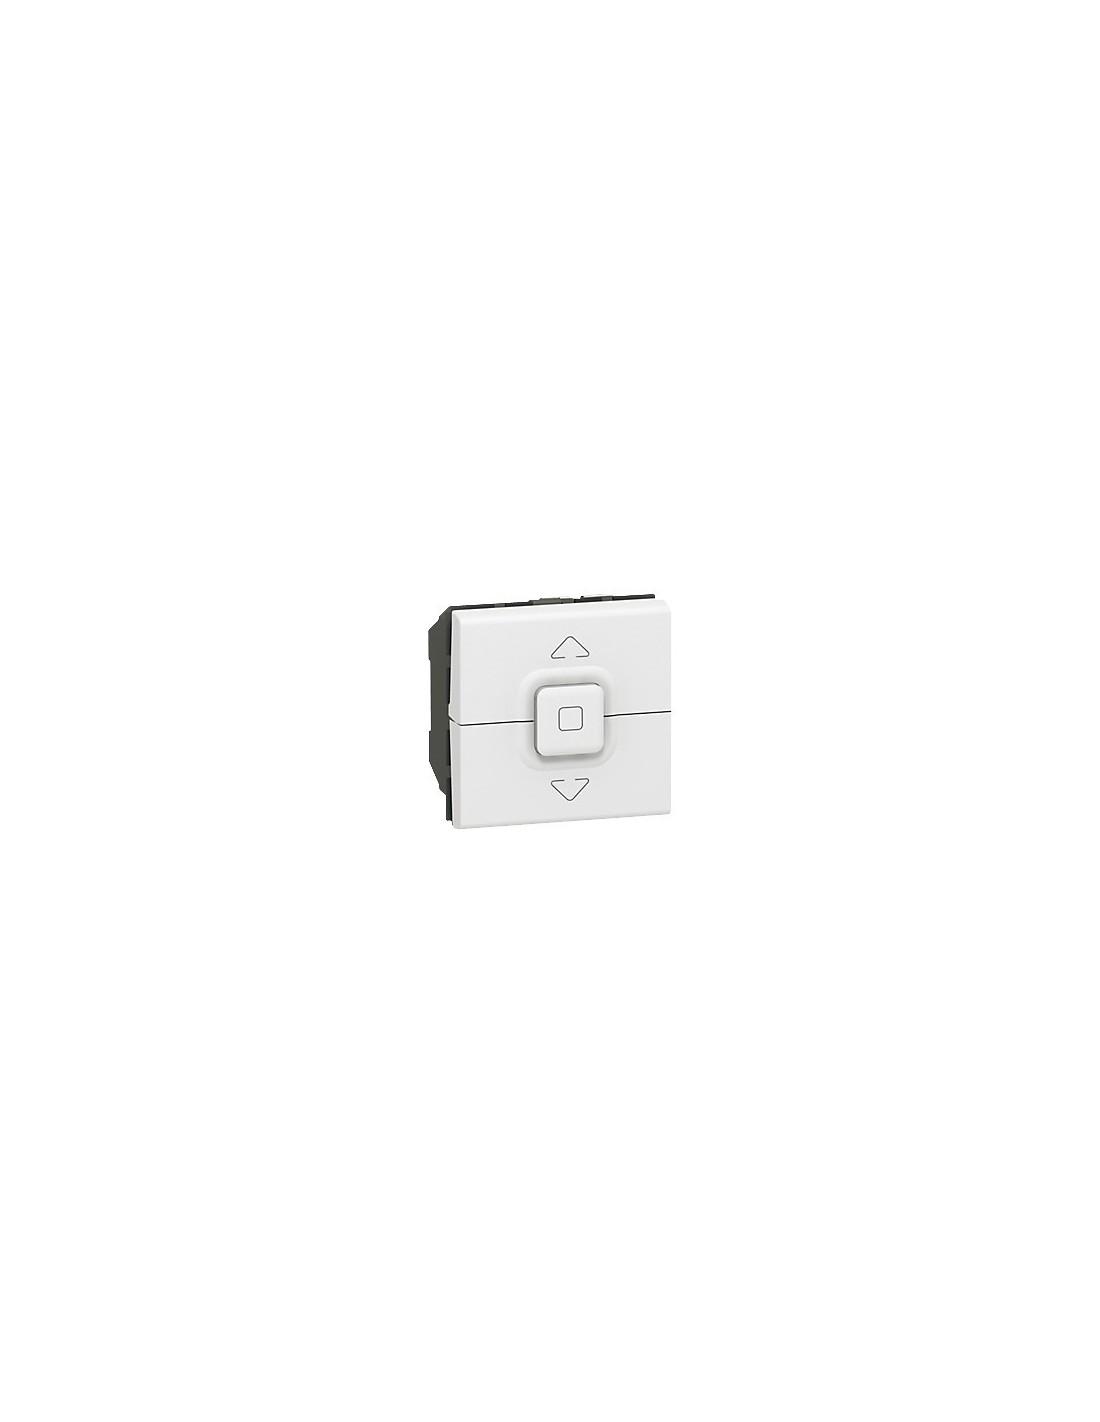 interrupteur volet roulant mosaic legrand. Black Bedroom Furniture Sets. Home Design Ideas